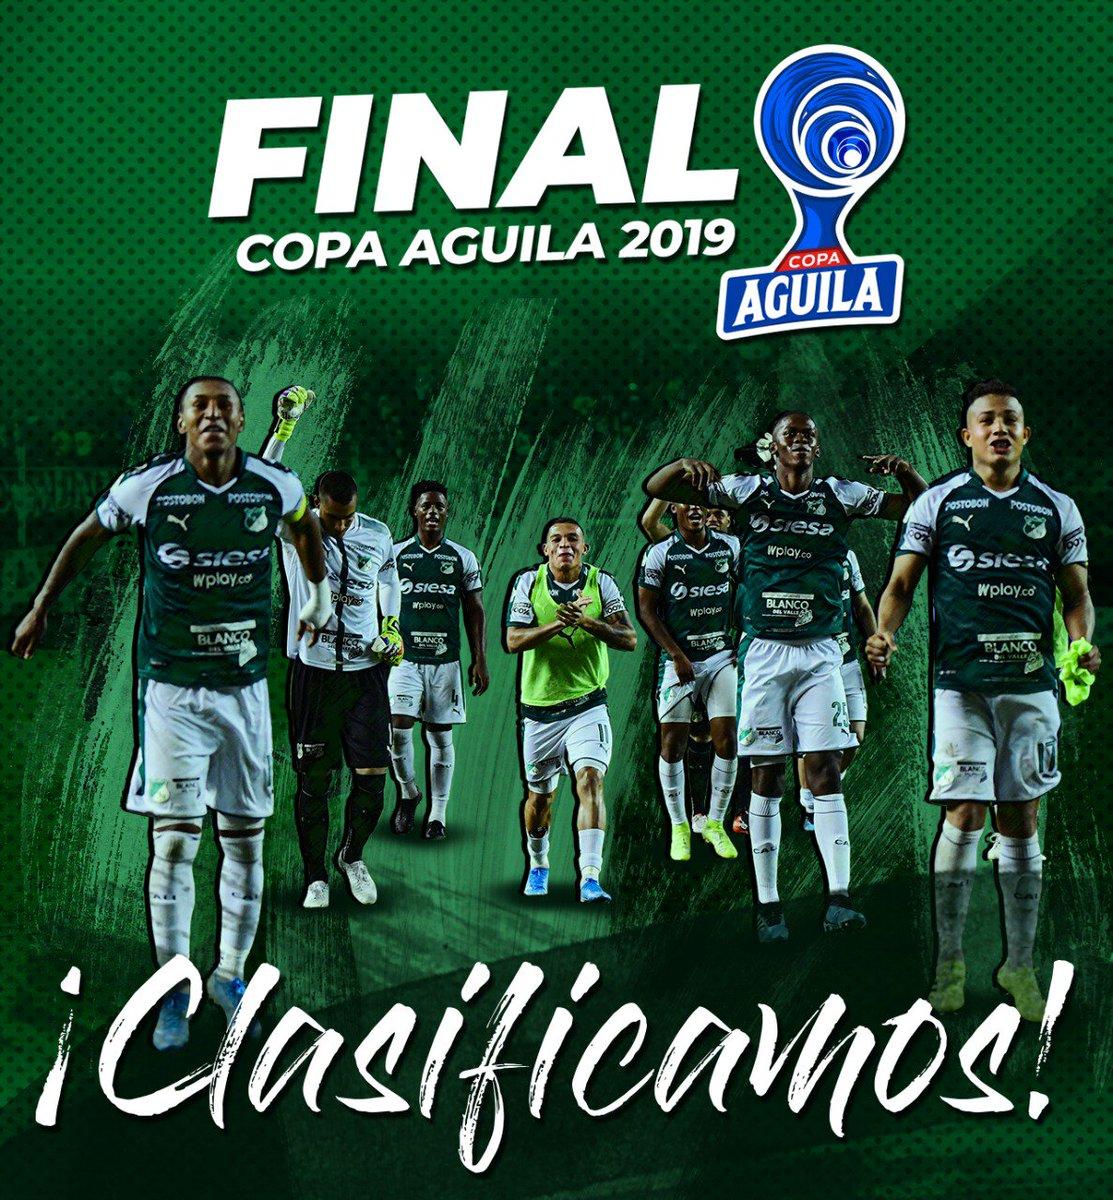 #CopaAguila  💚